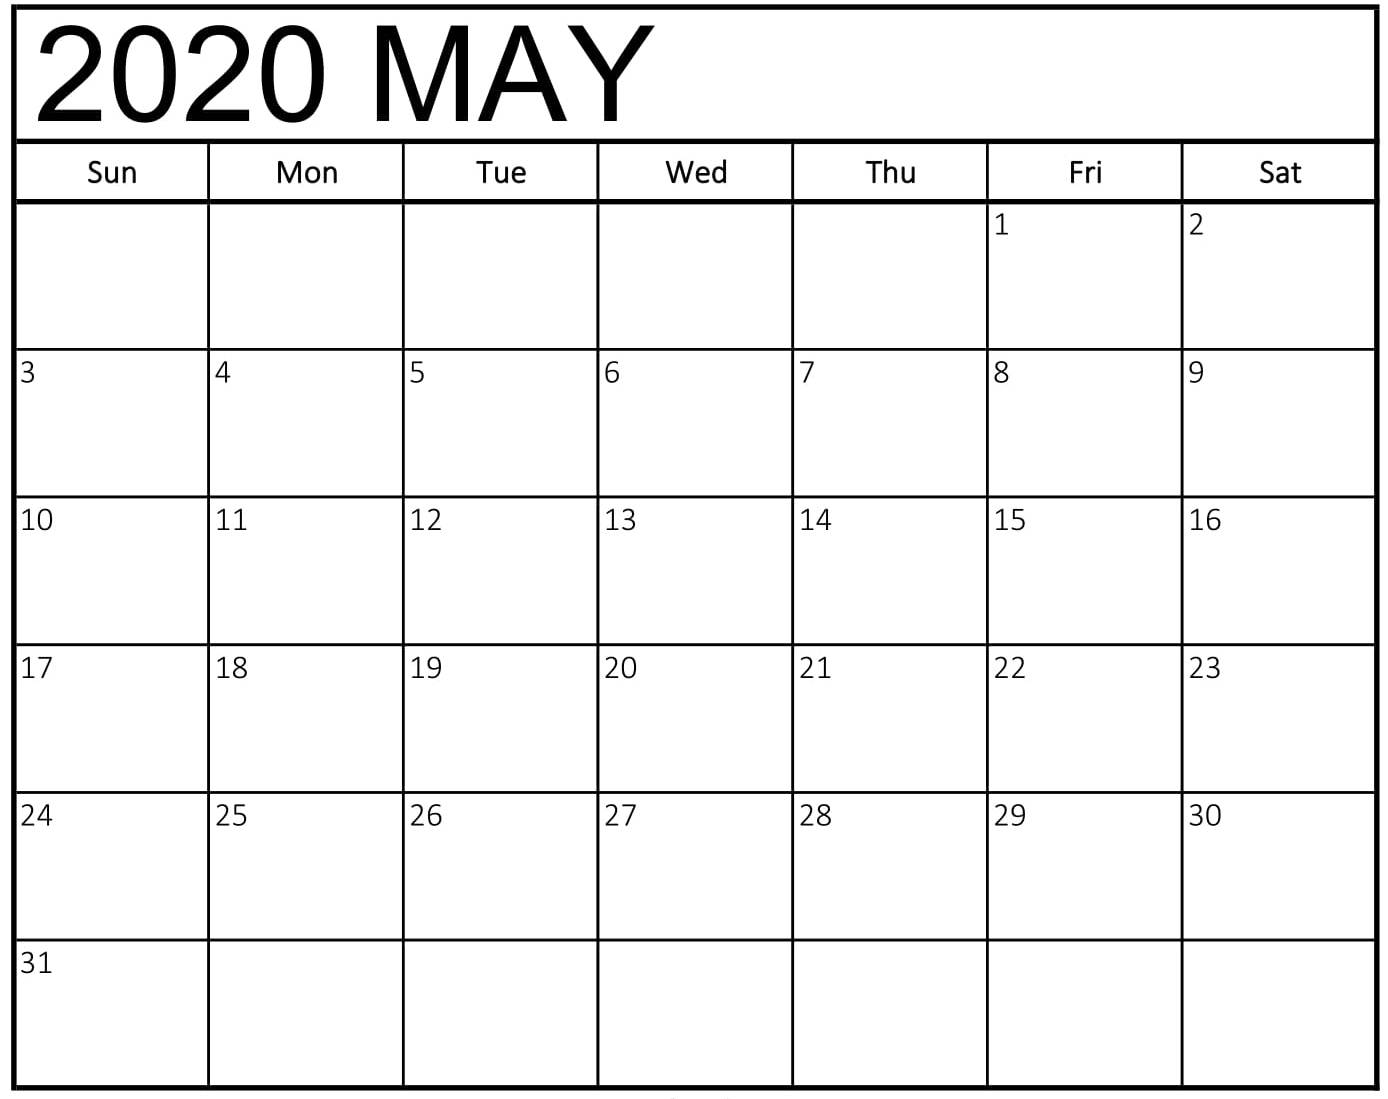 Print Blank Calendar May 2020